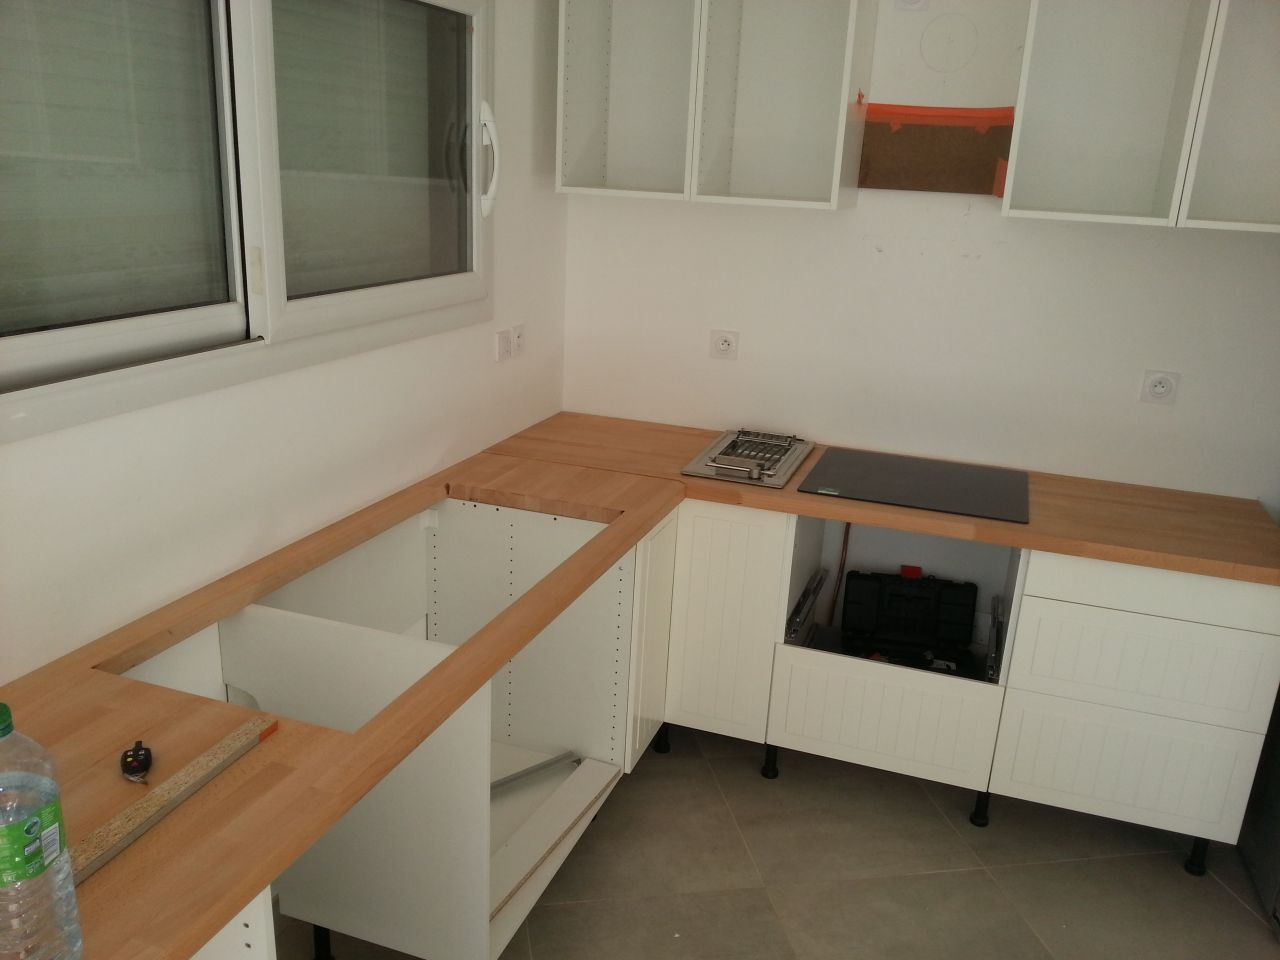 Fabriquer meuble salle de bain avec plan de - Fabriquer son meuble de cuisine ...